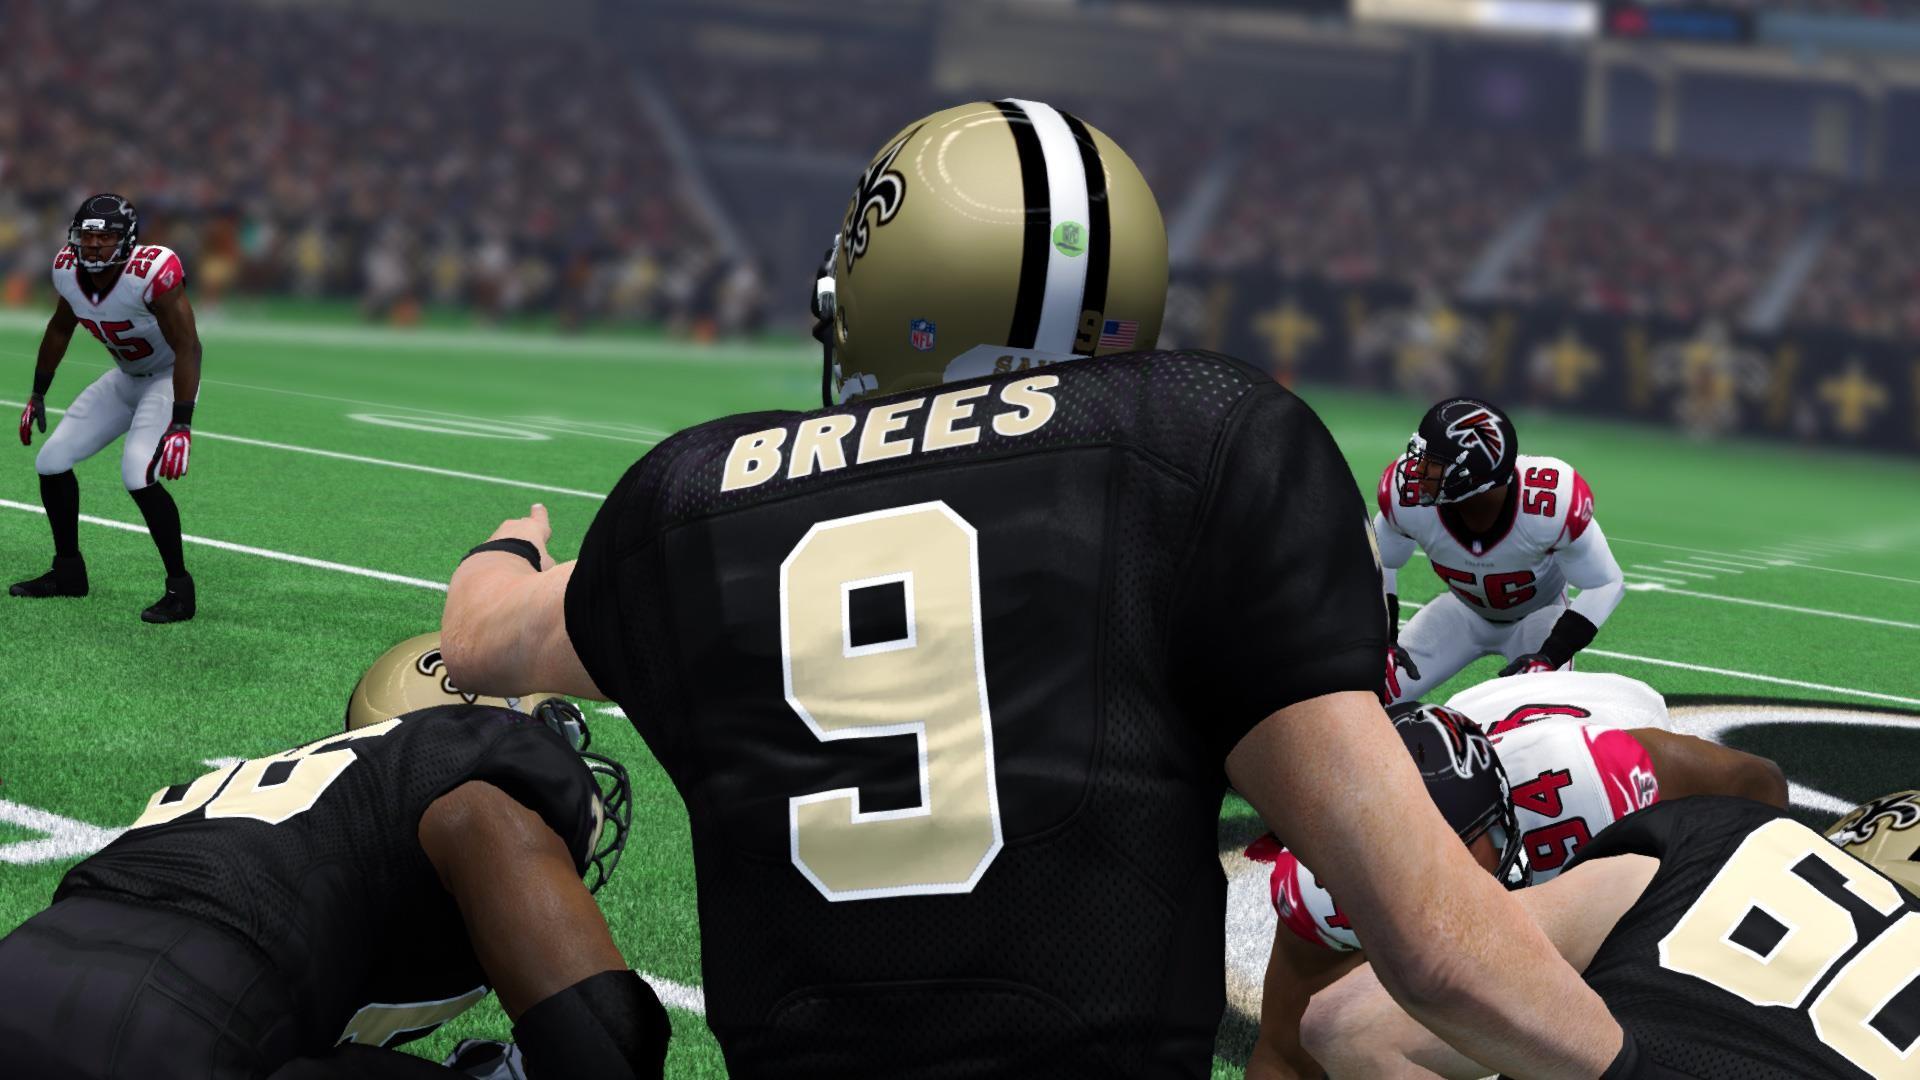 Drew Brees Legacy Award in Madden NFL 25